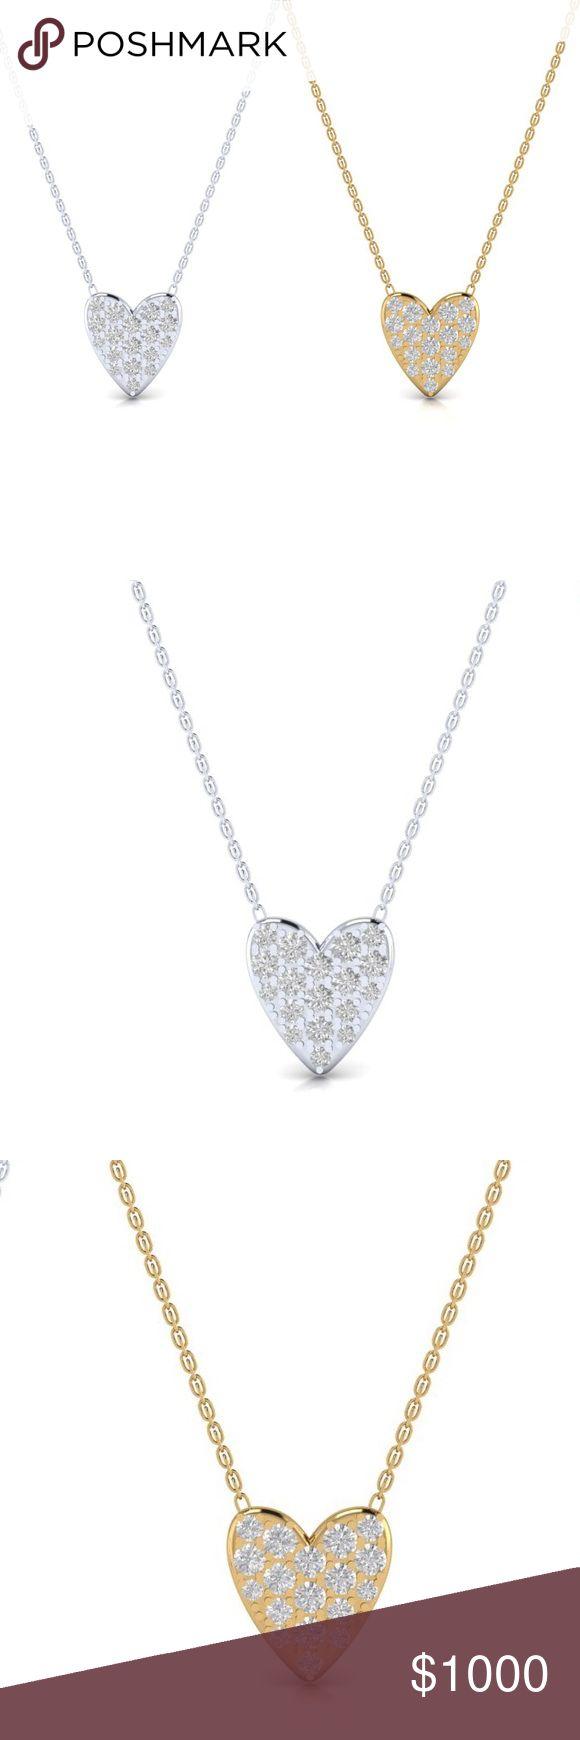 💛✨💎Pavé diamond heart necklaces Diamond heart necklaces! By Kate Alexandra Jewelry (Private Jeweler!) available in 14k, 18k gold + diamonds web: Kate - Alexandra . com 💛✨ kate alexandra jewelry Jewelry Necklaces